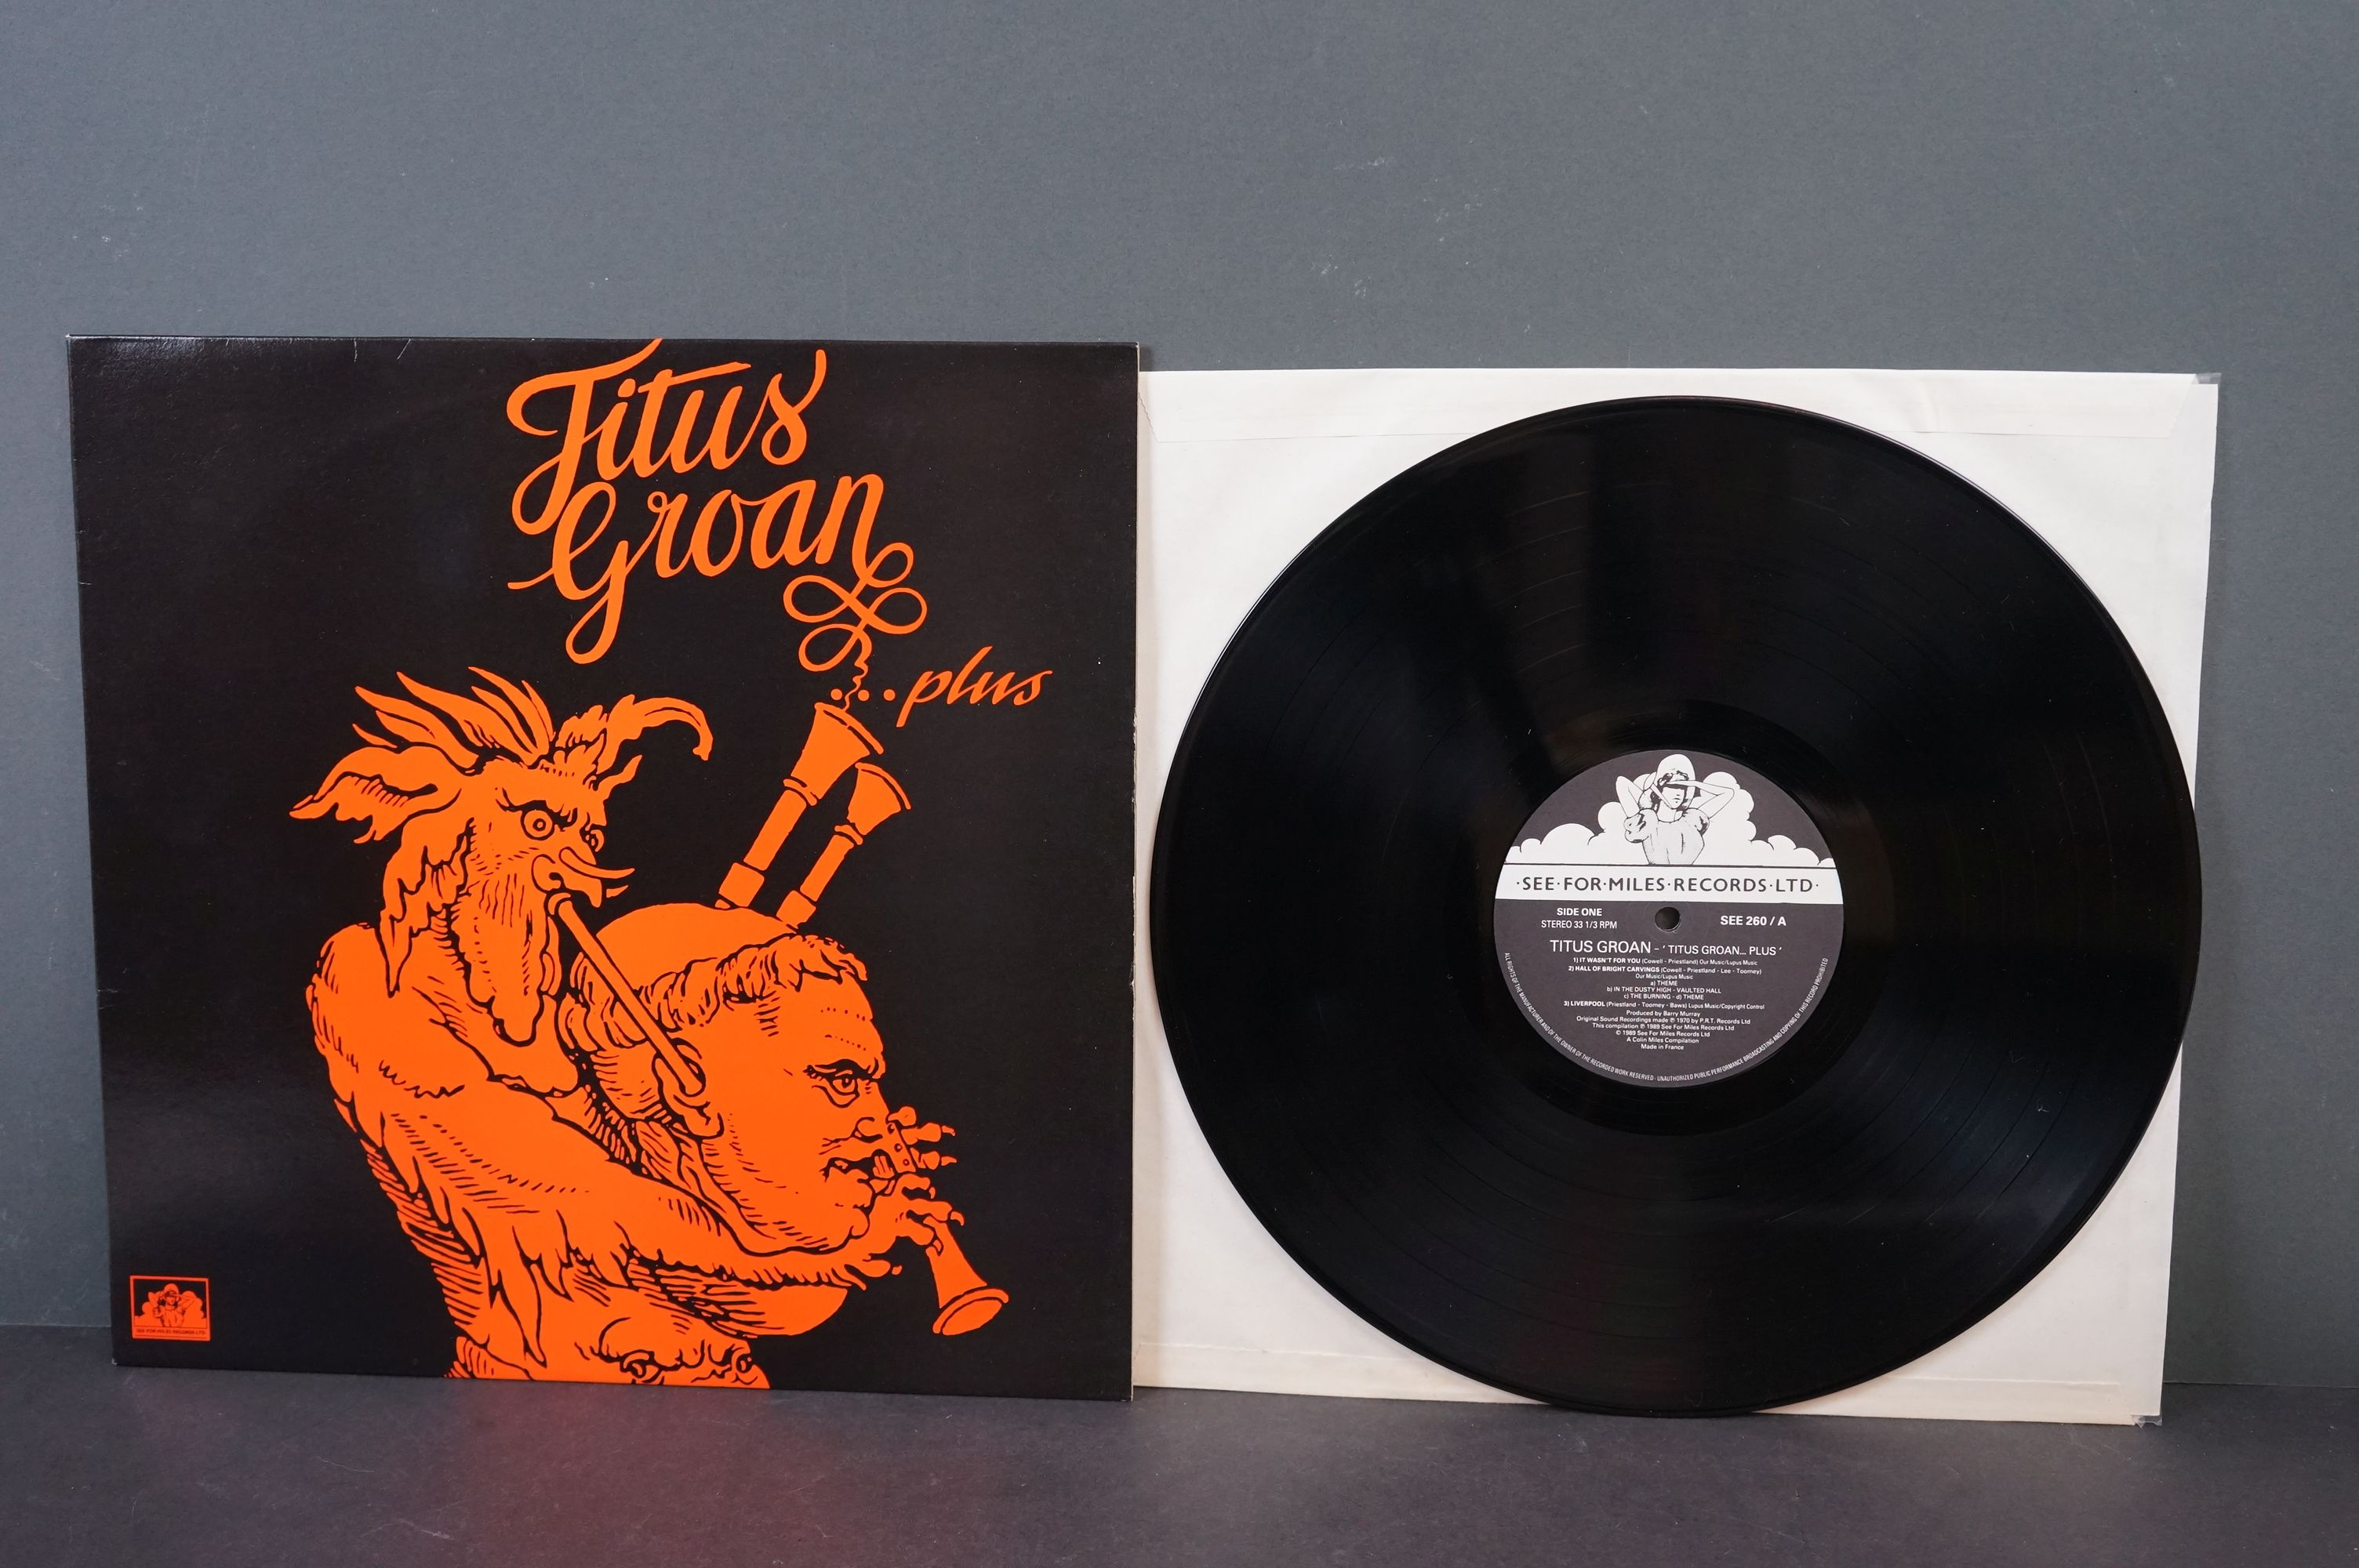 Vinyl - Psych / Prog - Five long deleted reissues of UK Psych / Prog Albums. Open Mind - Open - Image 4 of 12